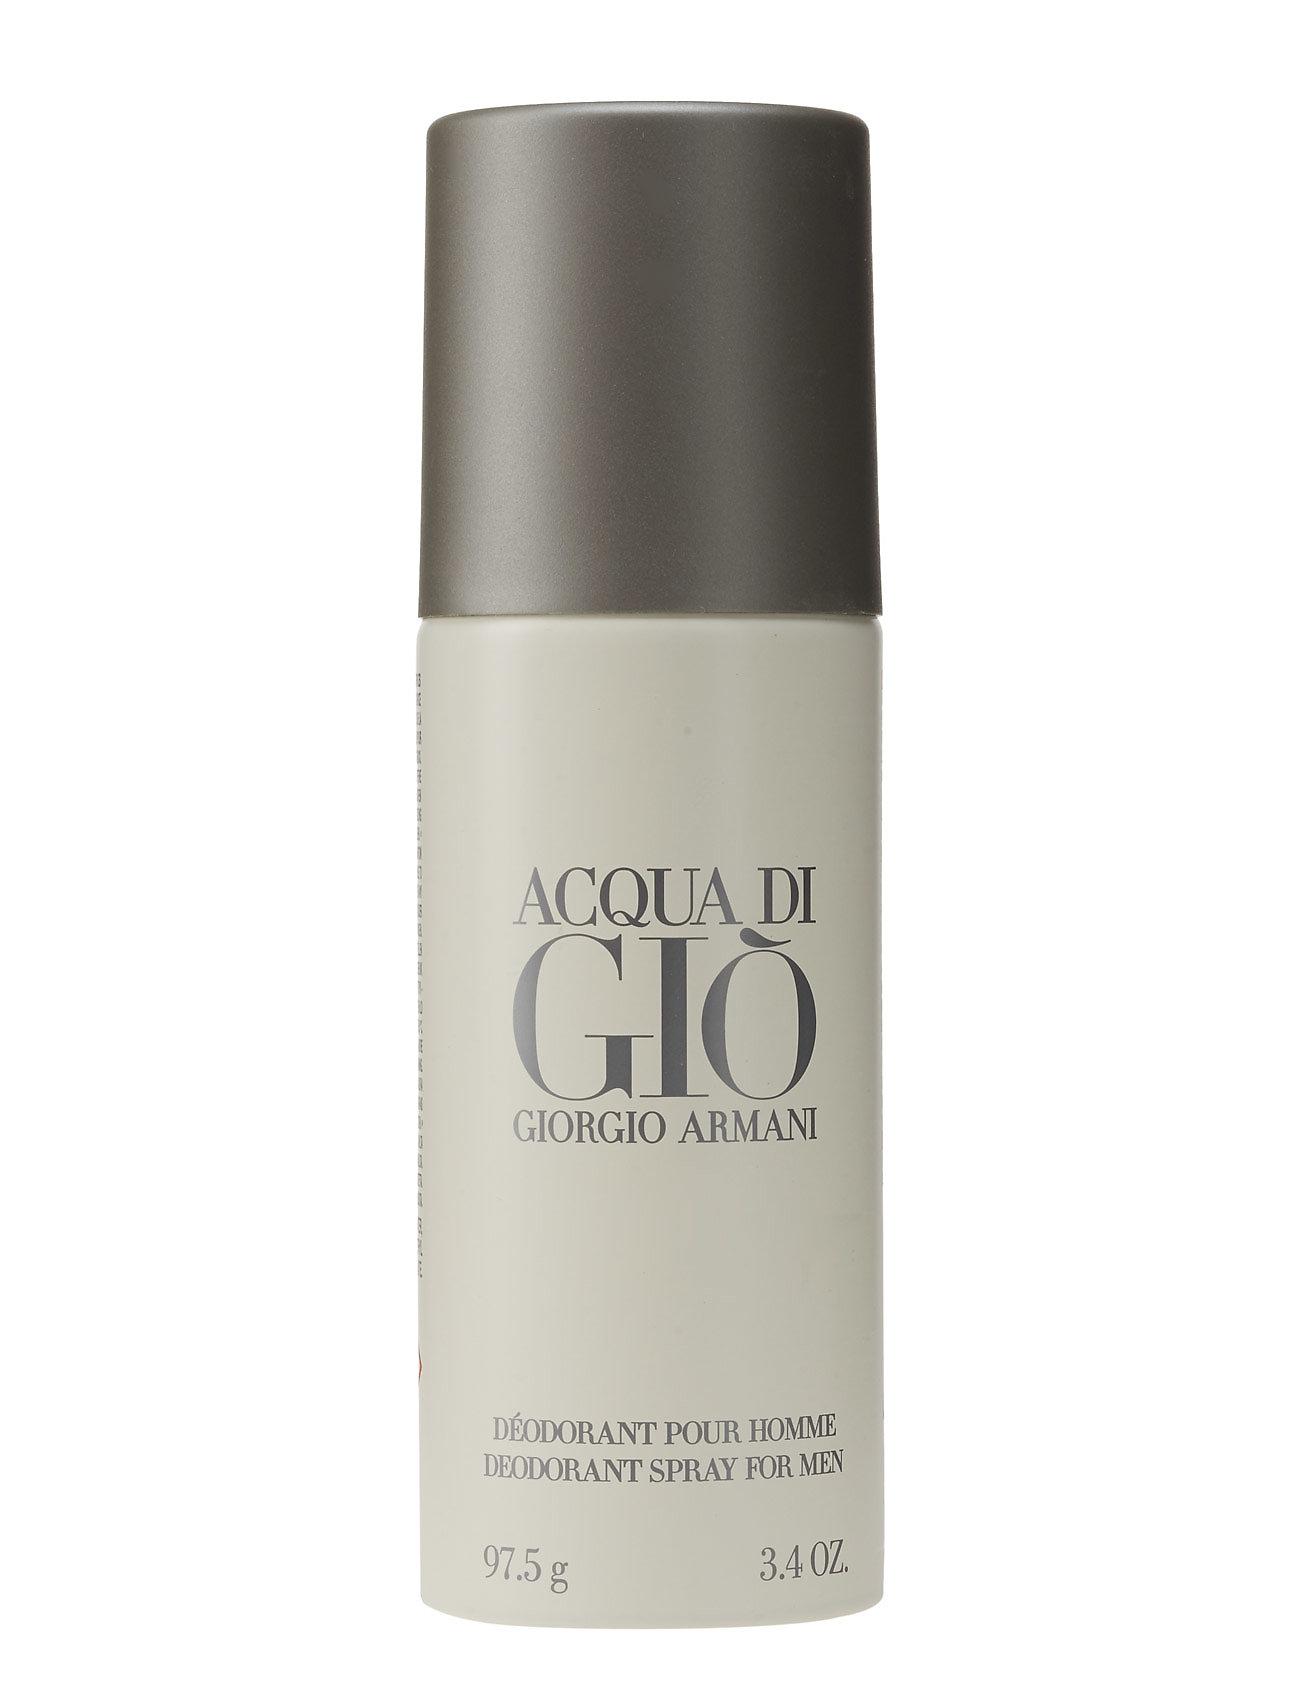 giorgio armani Acqua di giã² pour homme deodorant spray 150 ml på boozt.com dk